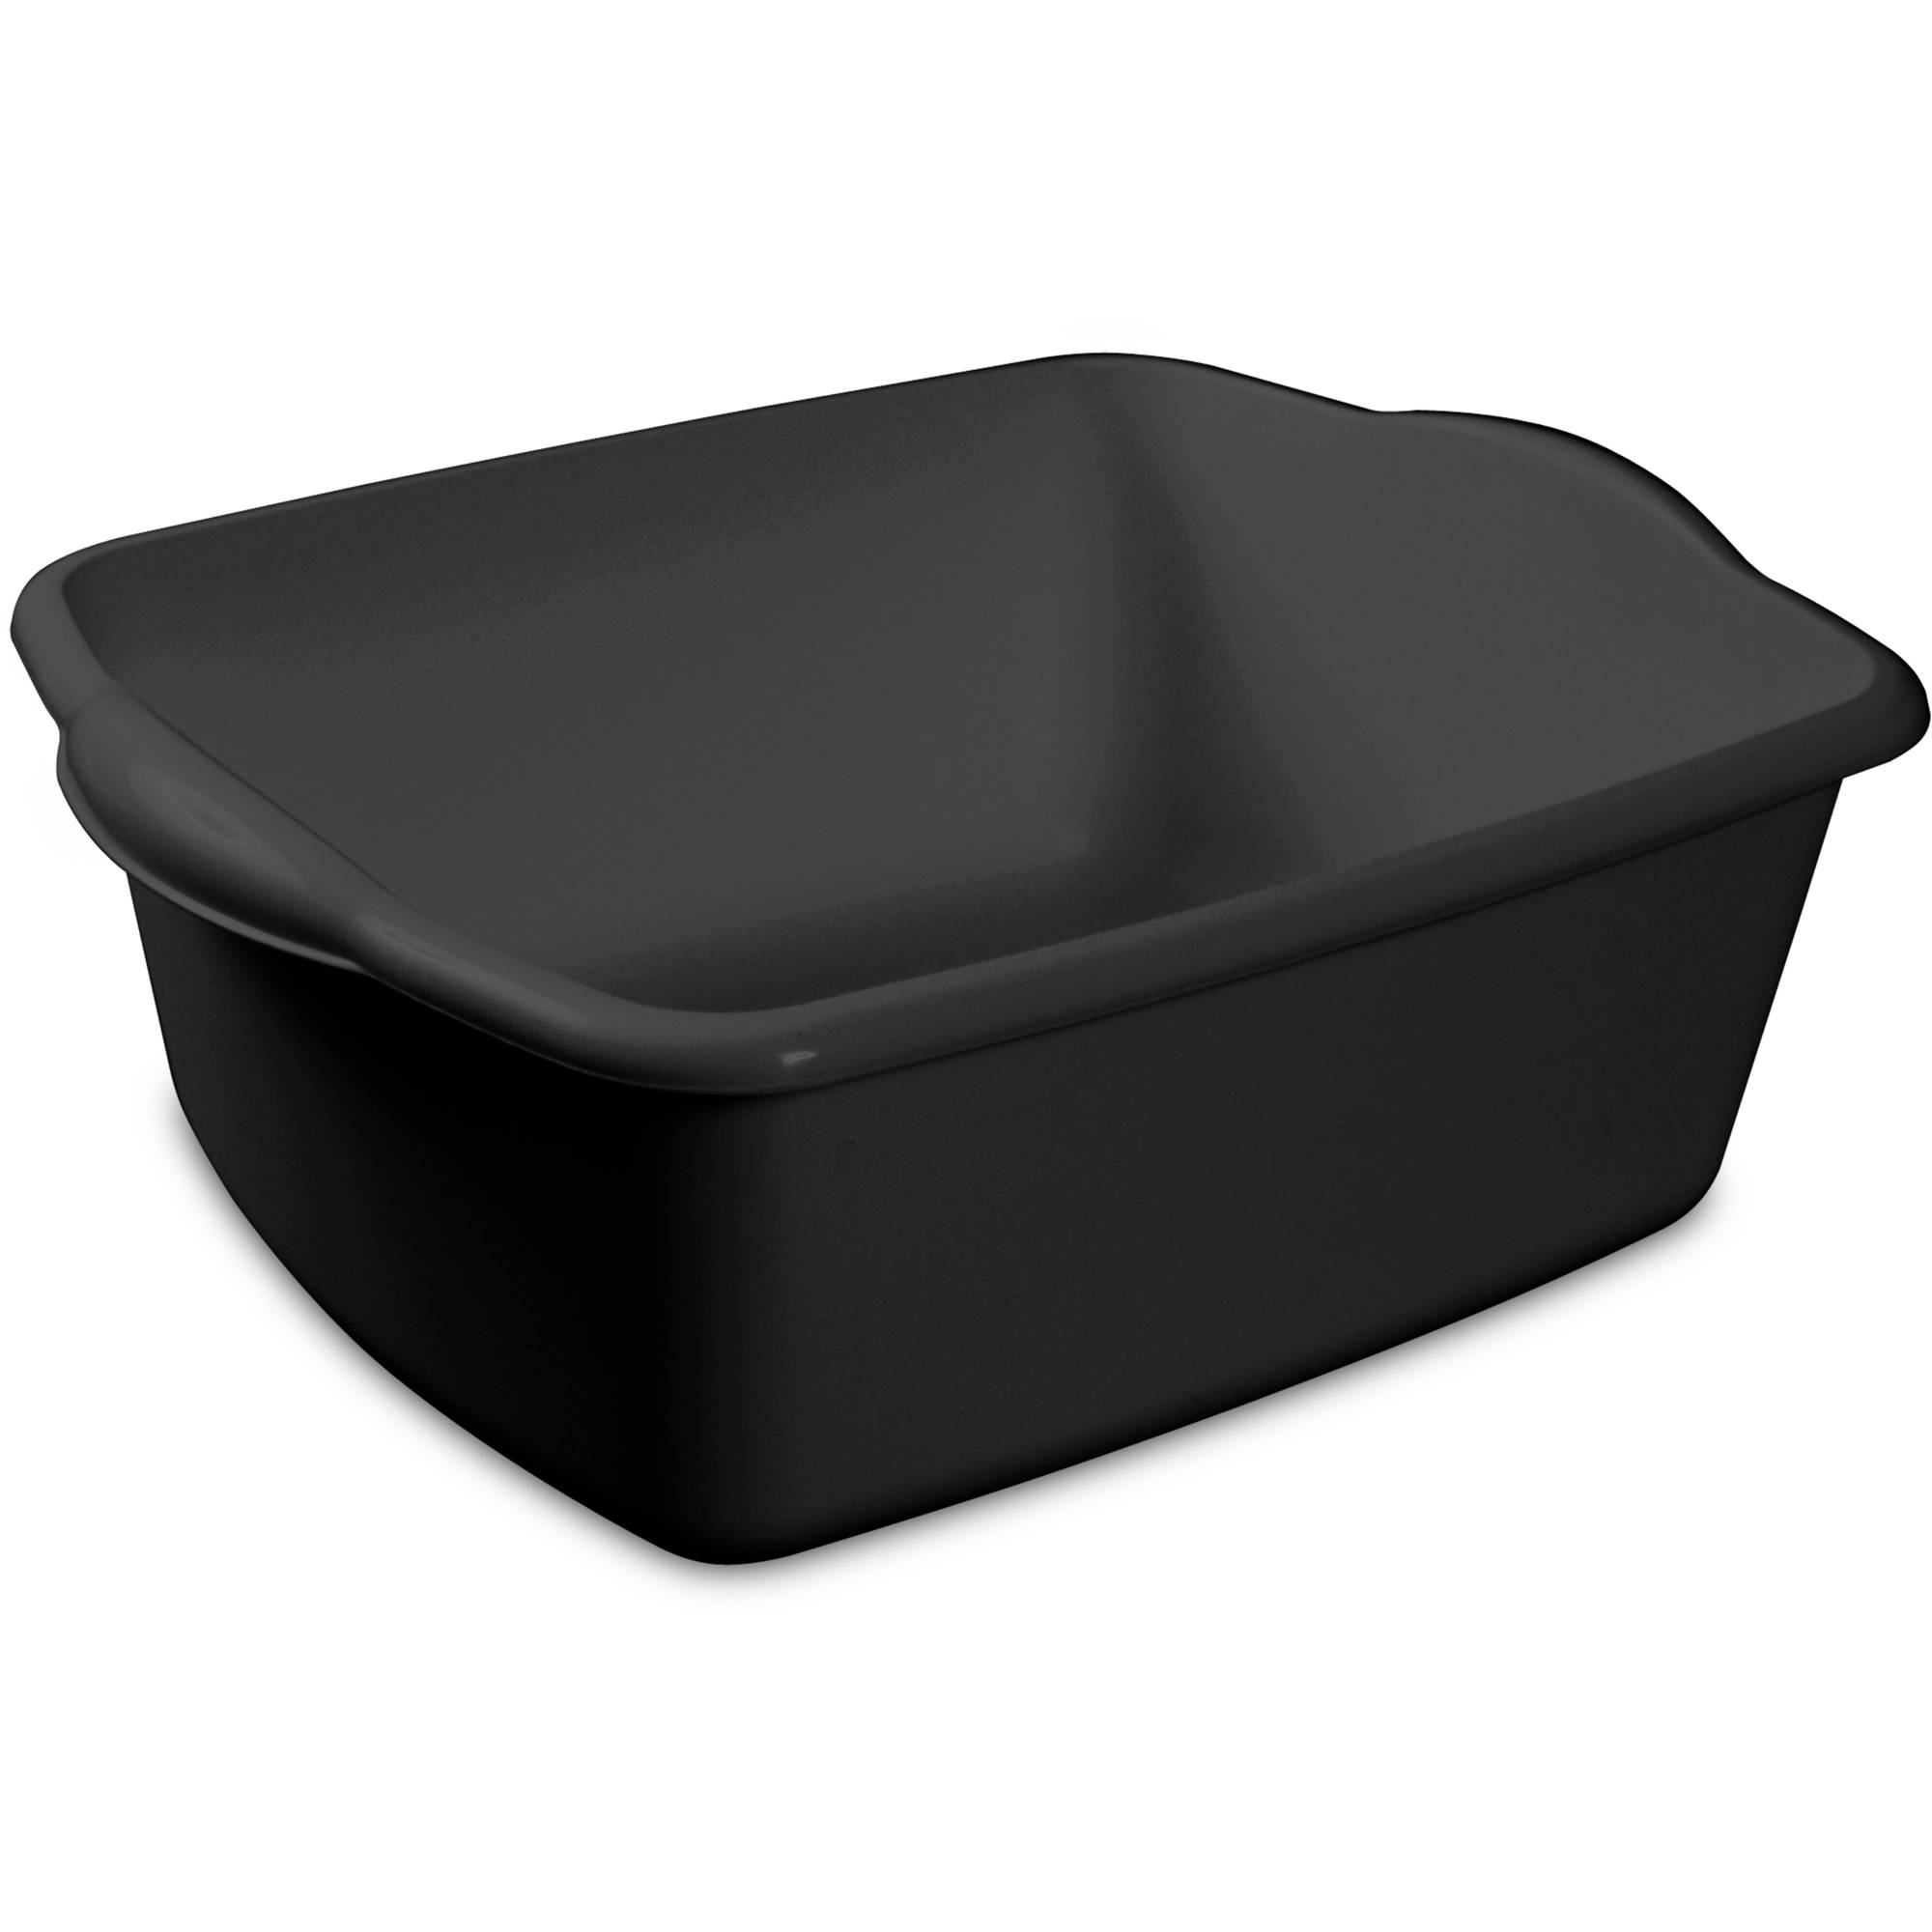 Sterilite 12-Quart Dishpan, Black